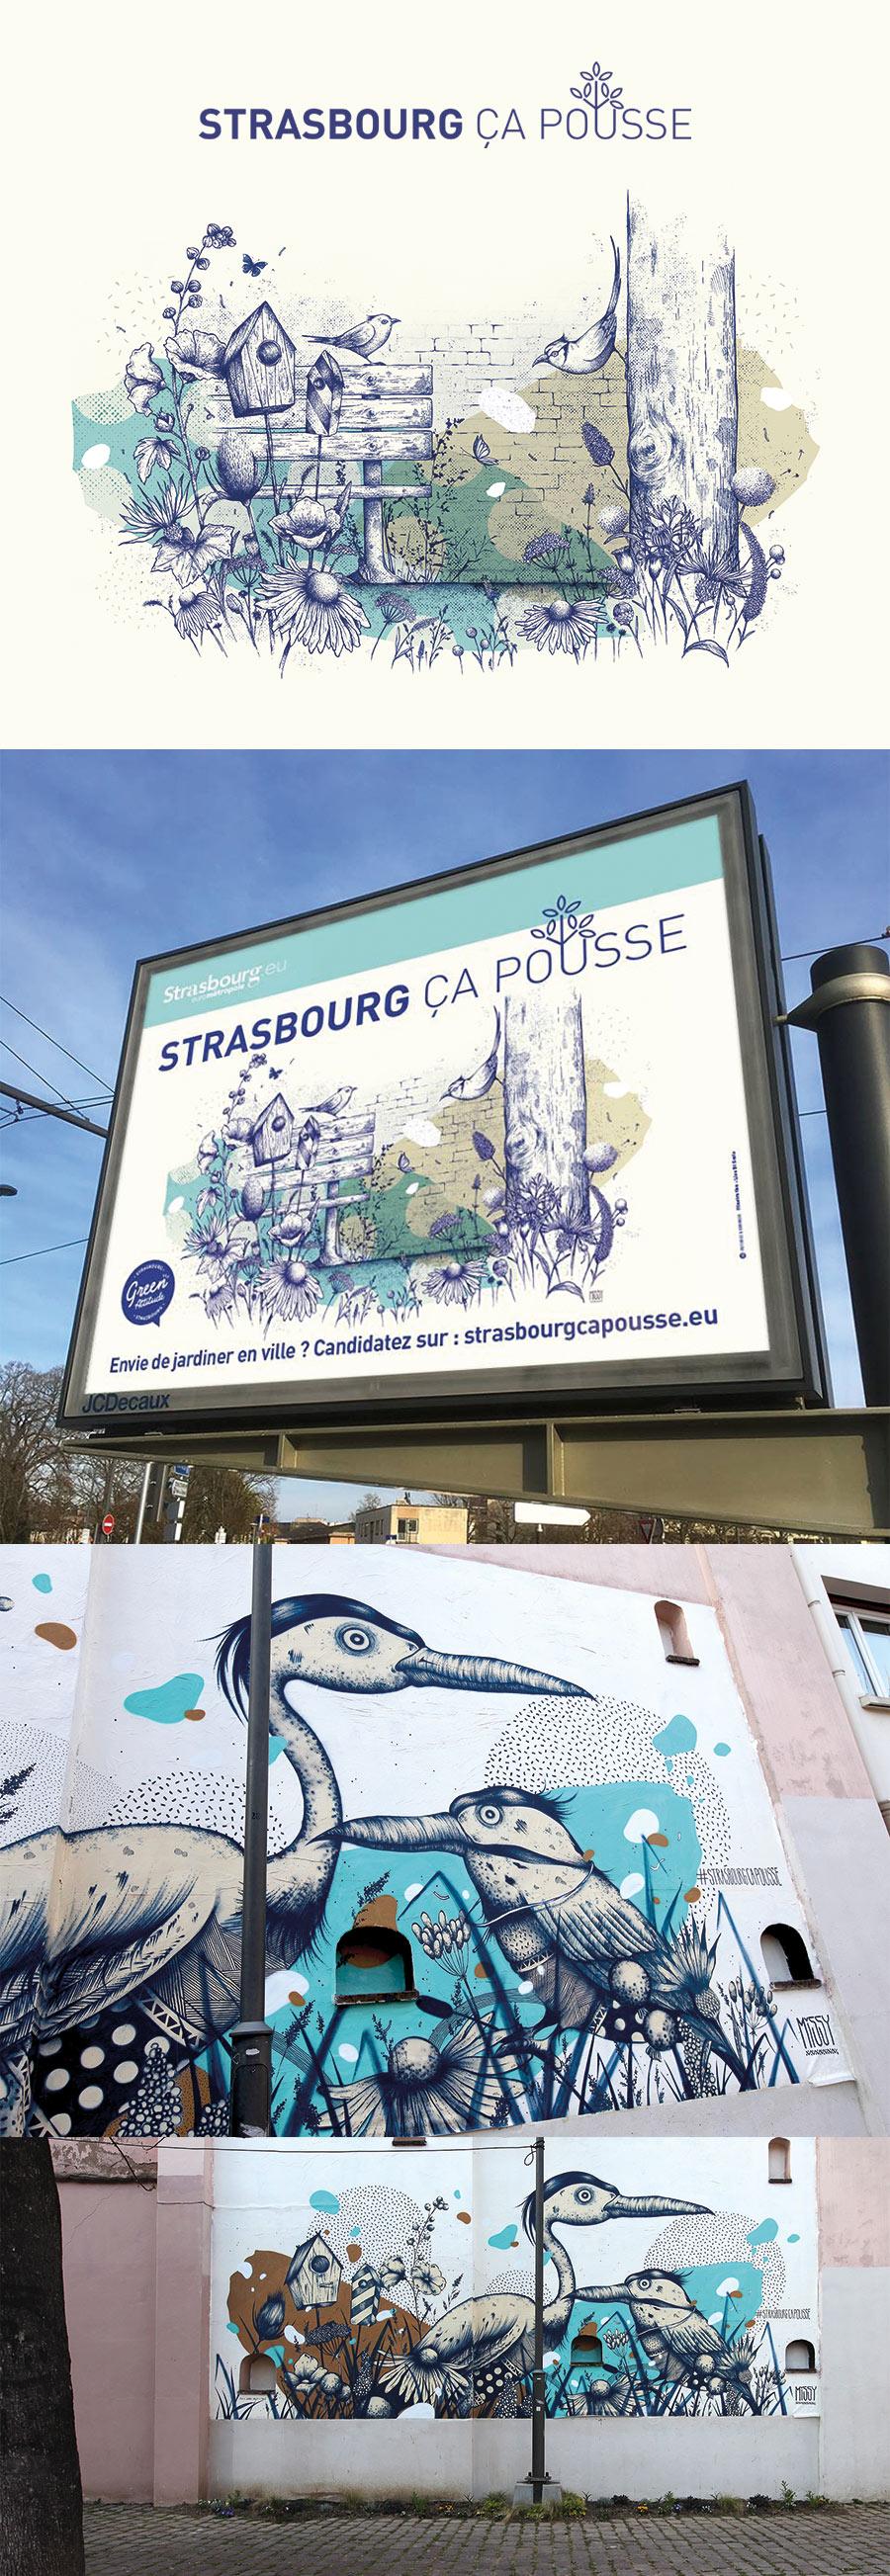 strasbourg-ca-pousse